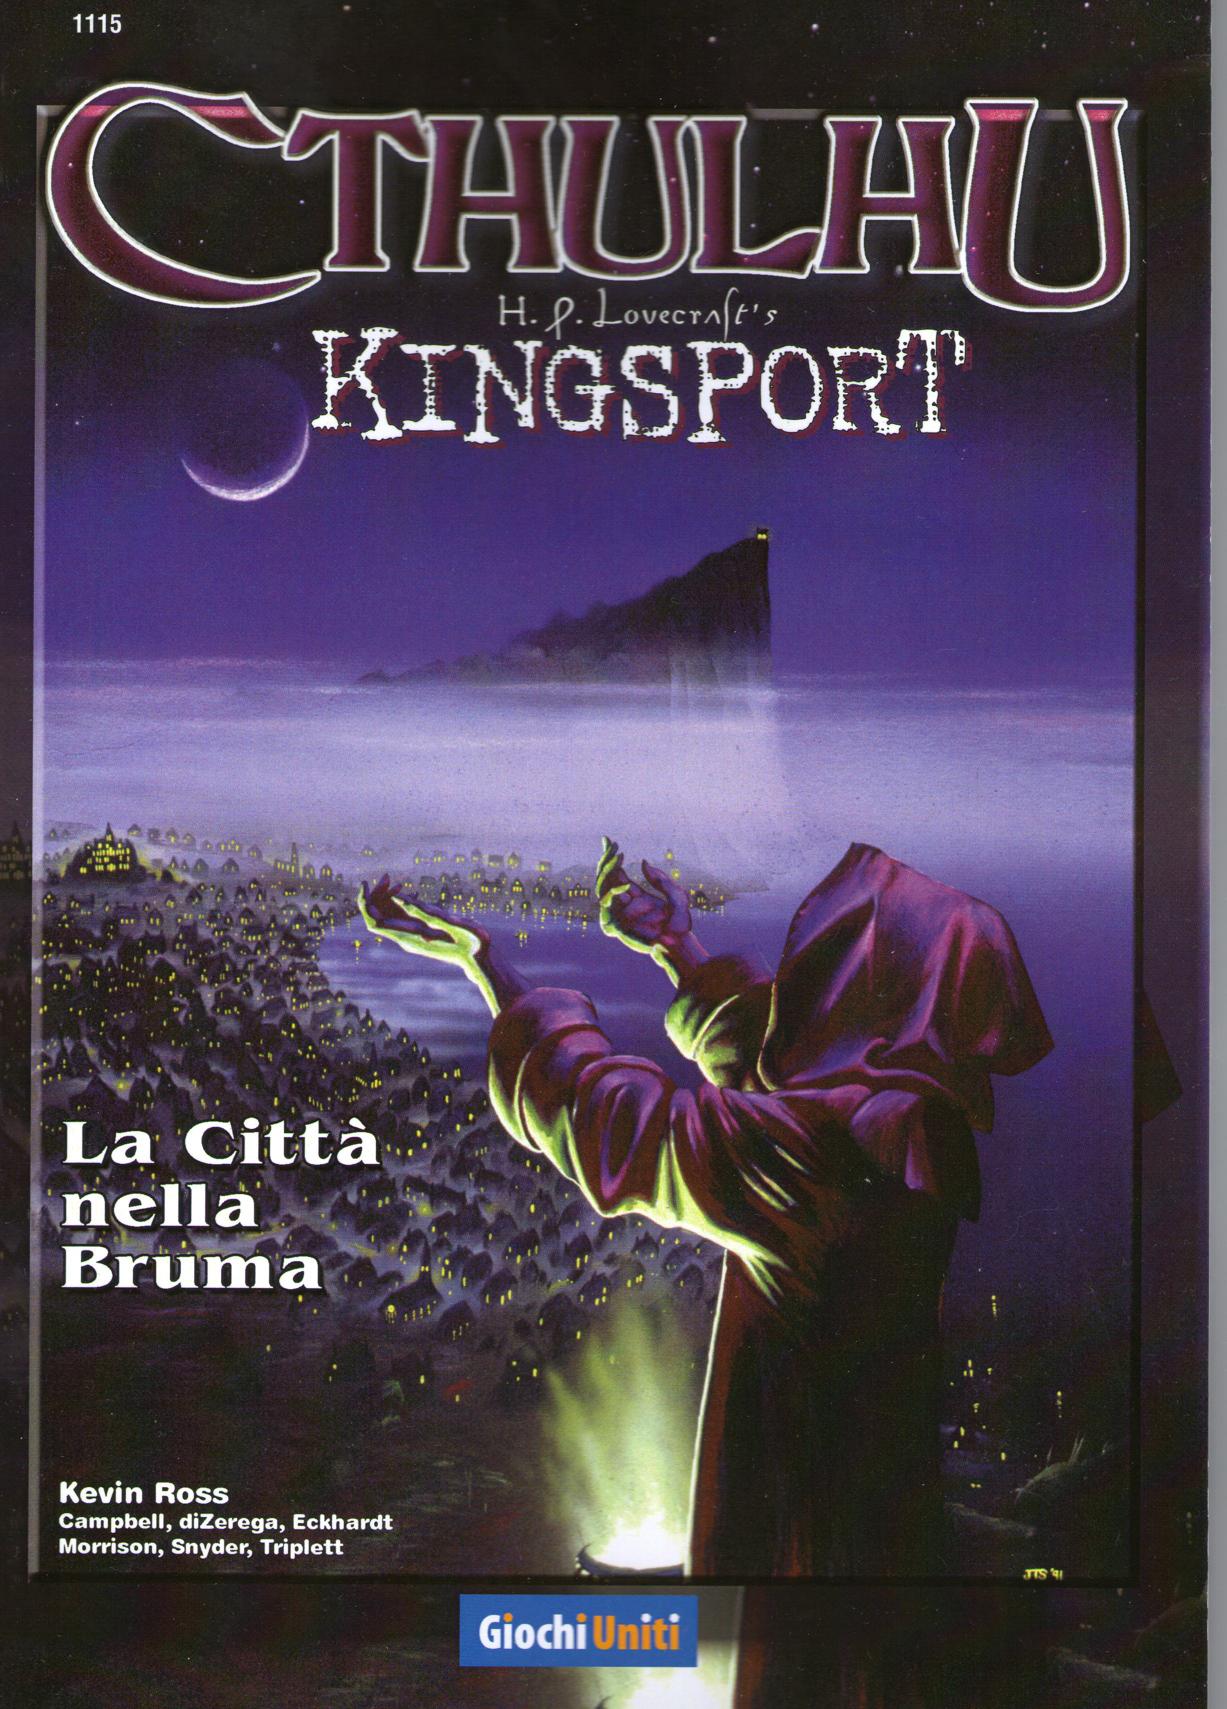 Cthulhu Kingsport